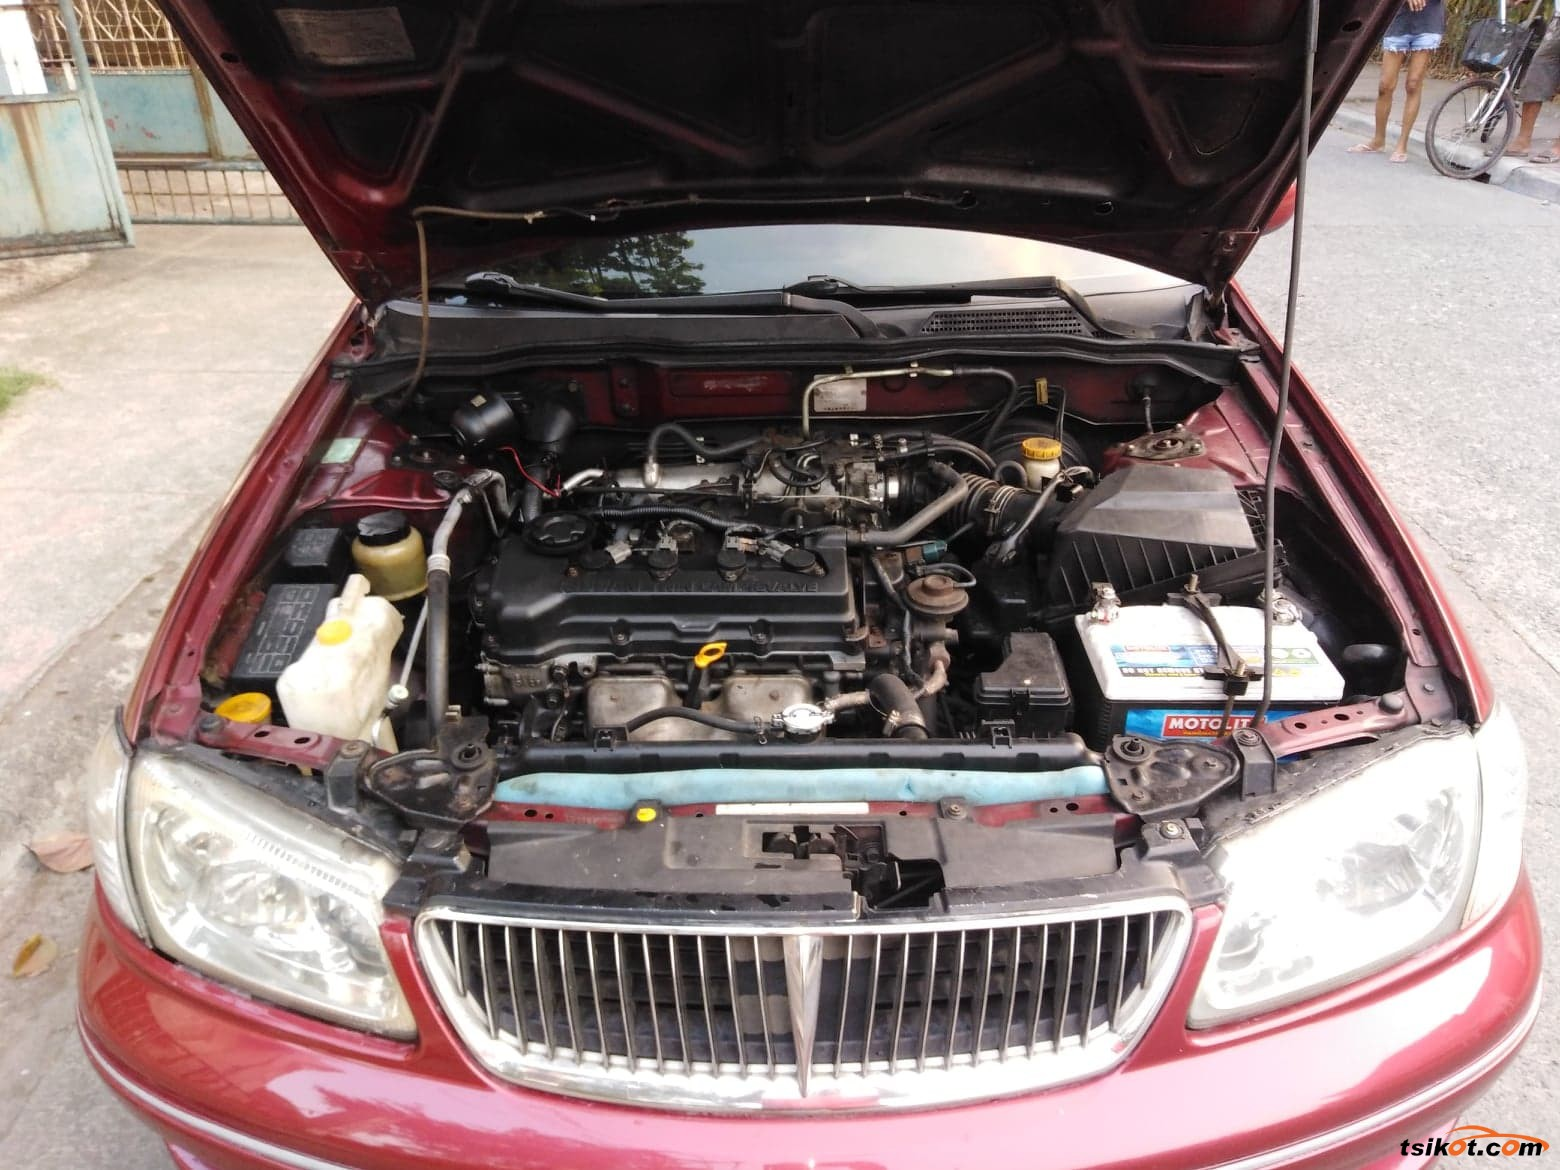 Nissan Sentra 2001 - 7